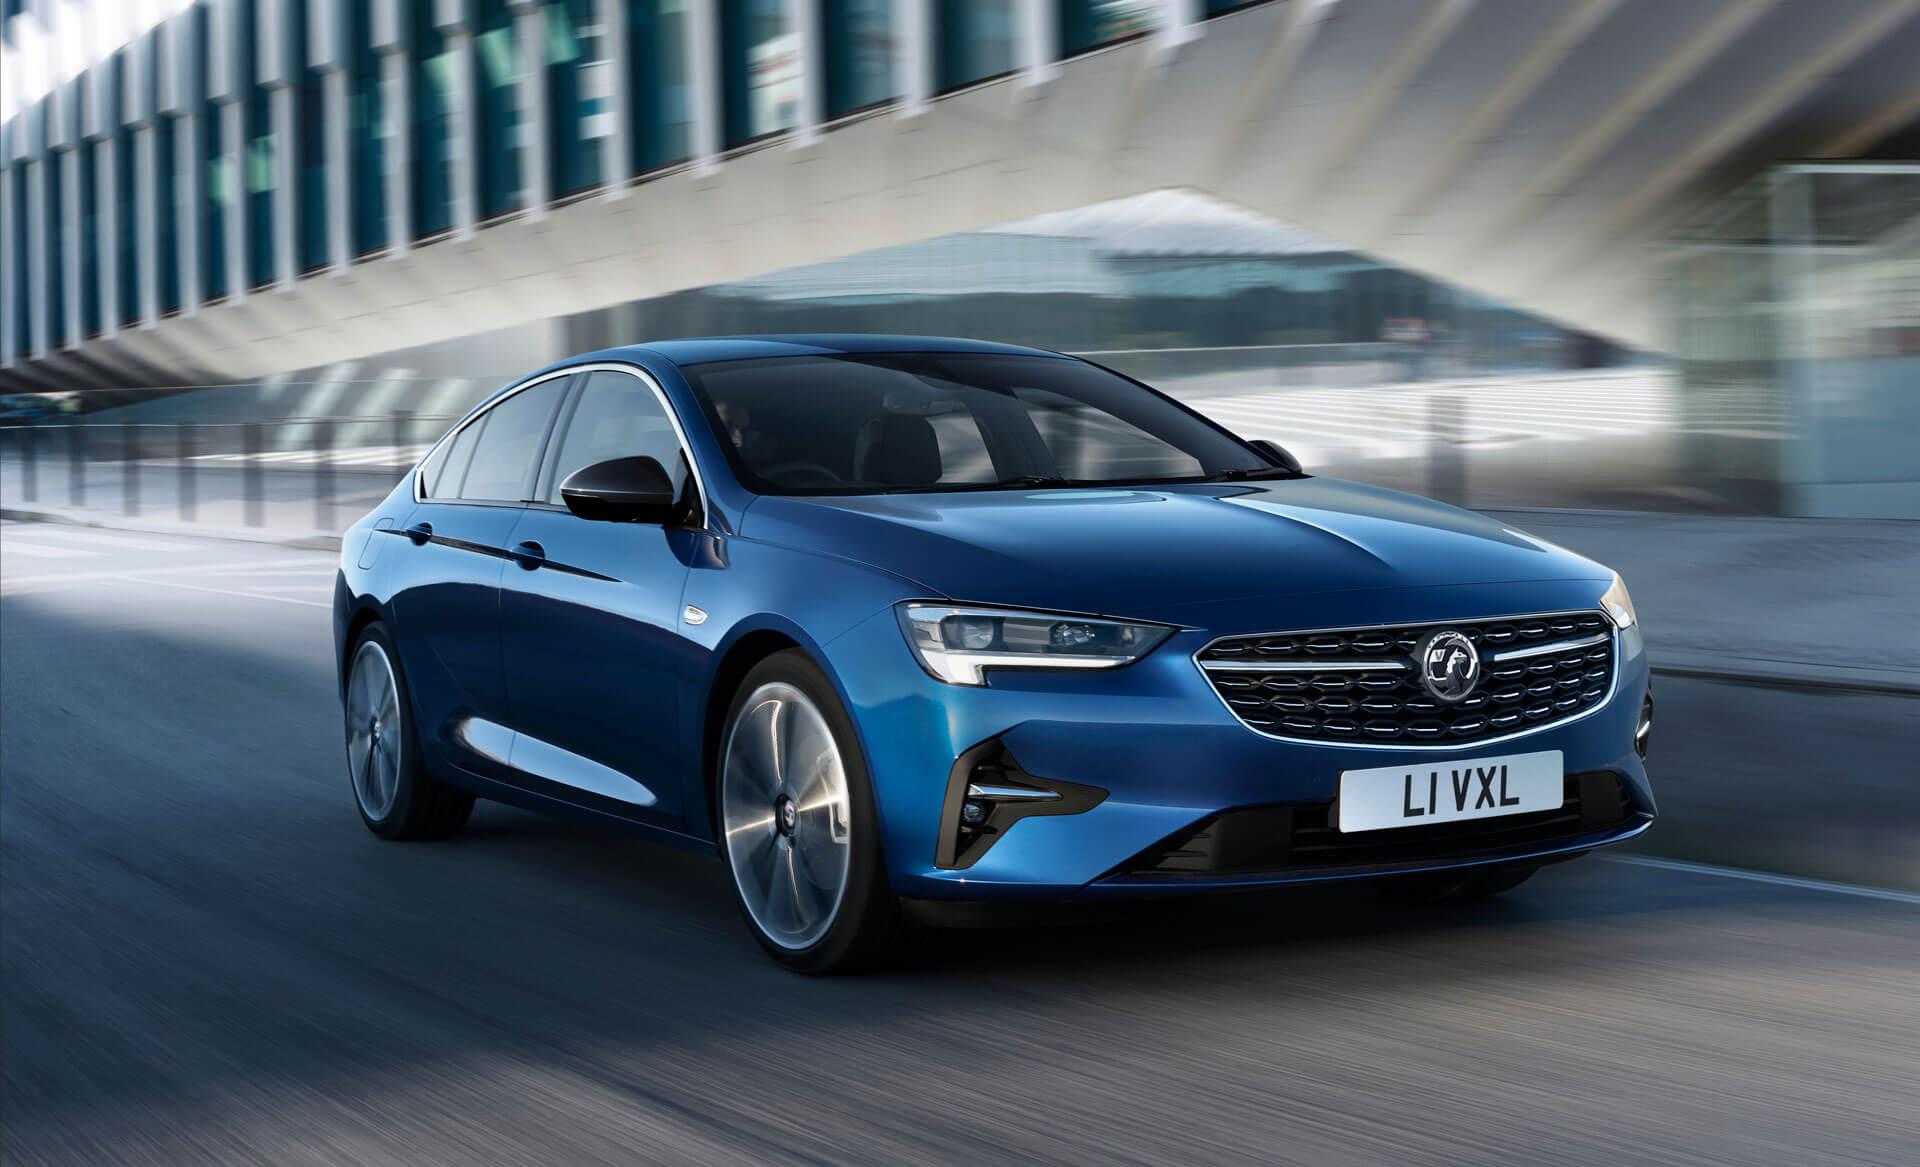 Opel/Vauxhall Insignia